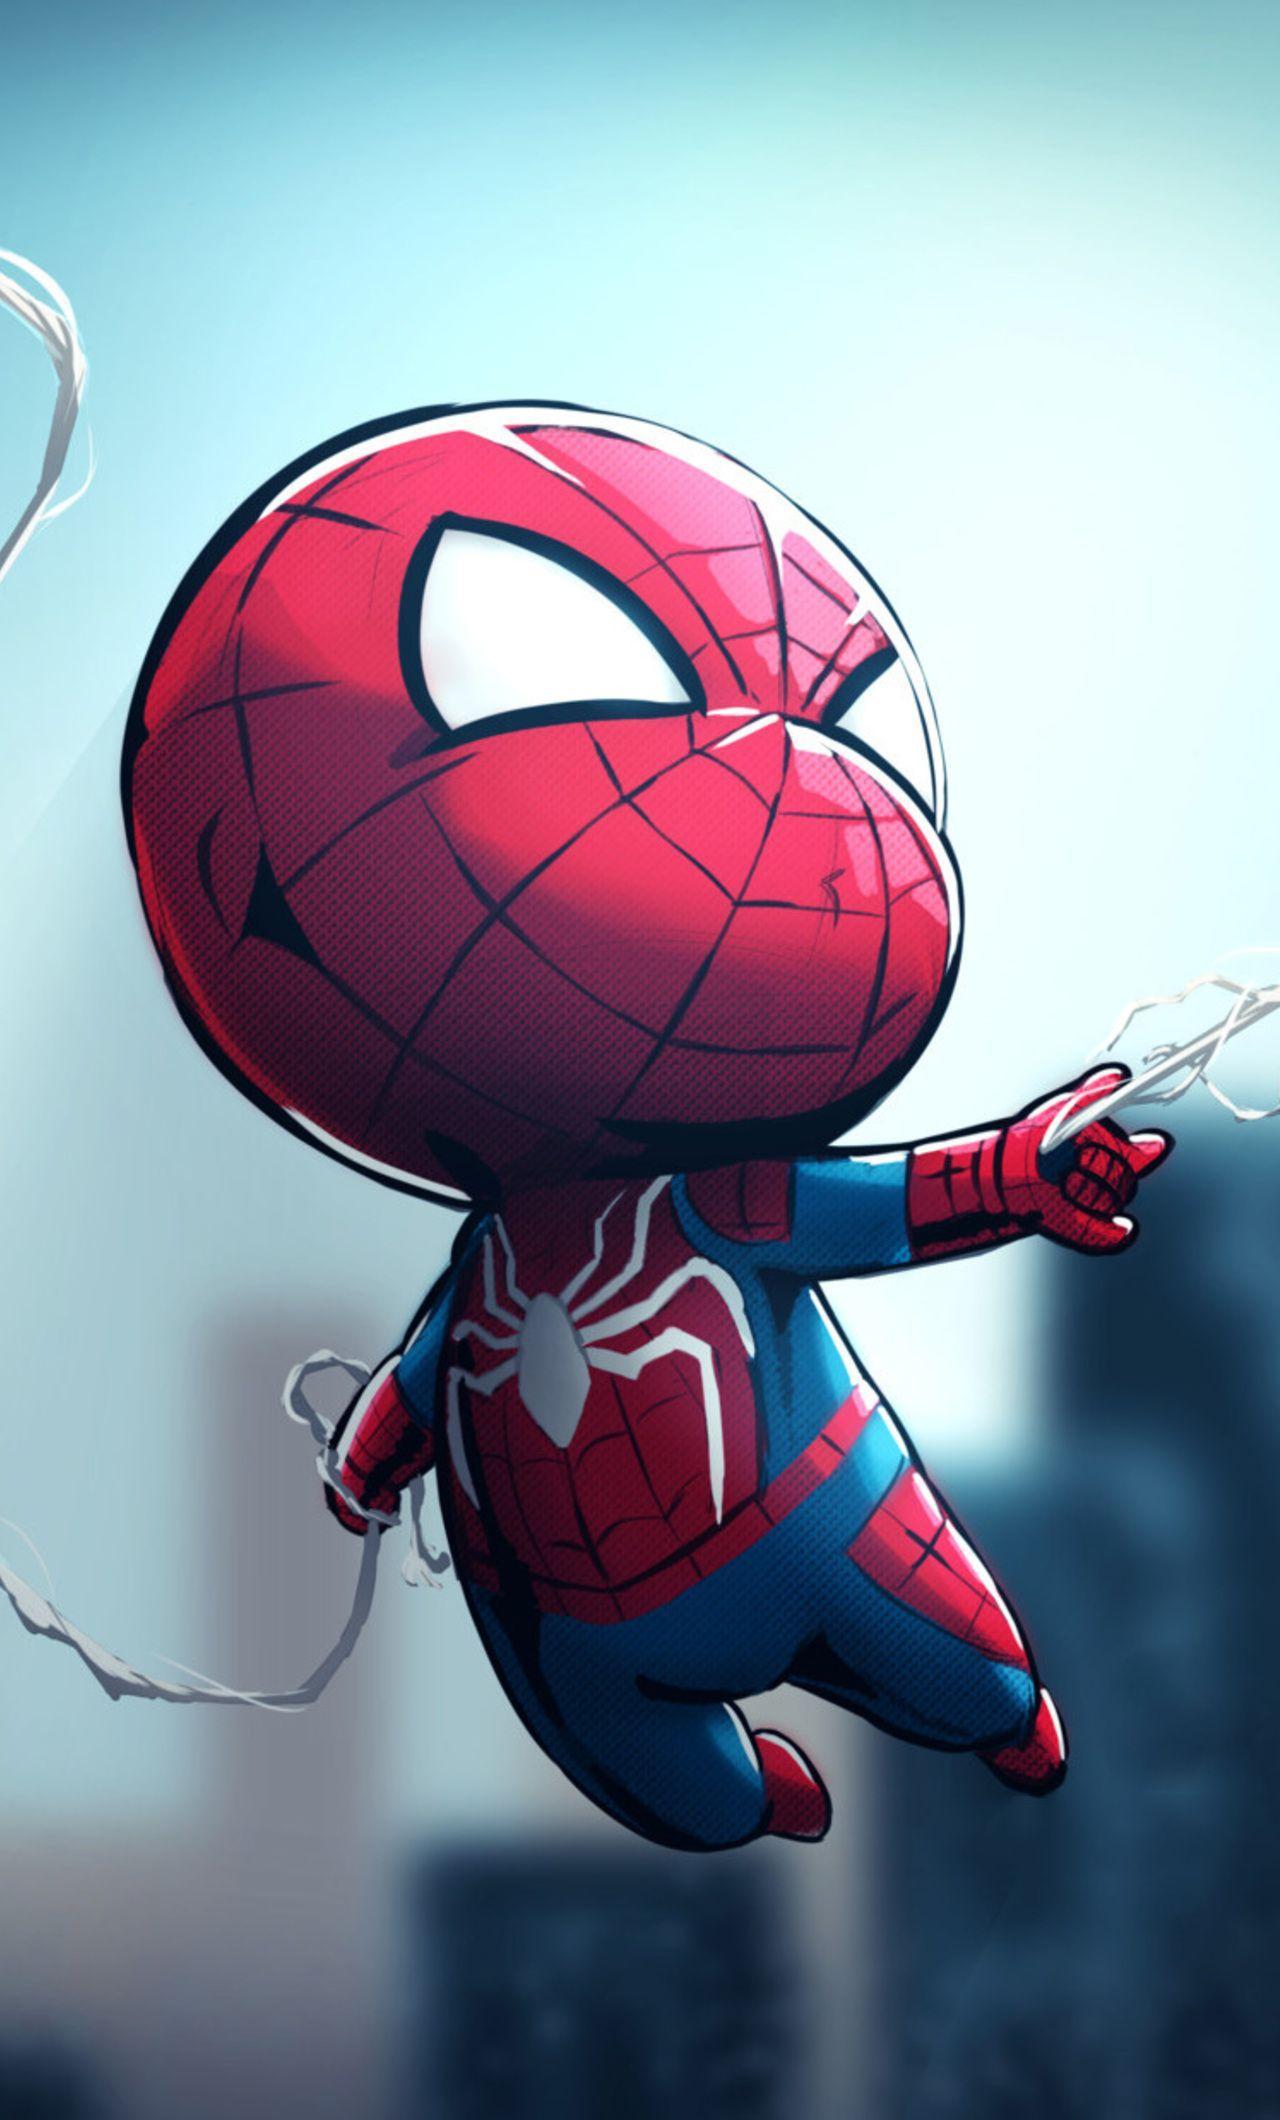 Spiderman Funny Wallpaper : spiderman, funny, wallpaper, Spiderman, Wallpapers, Backgrounds, WallpaperAccess